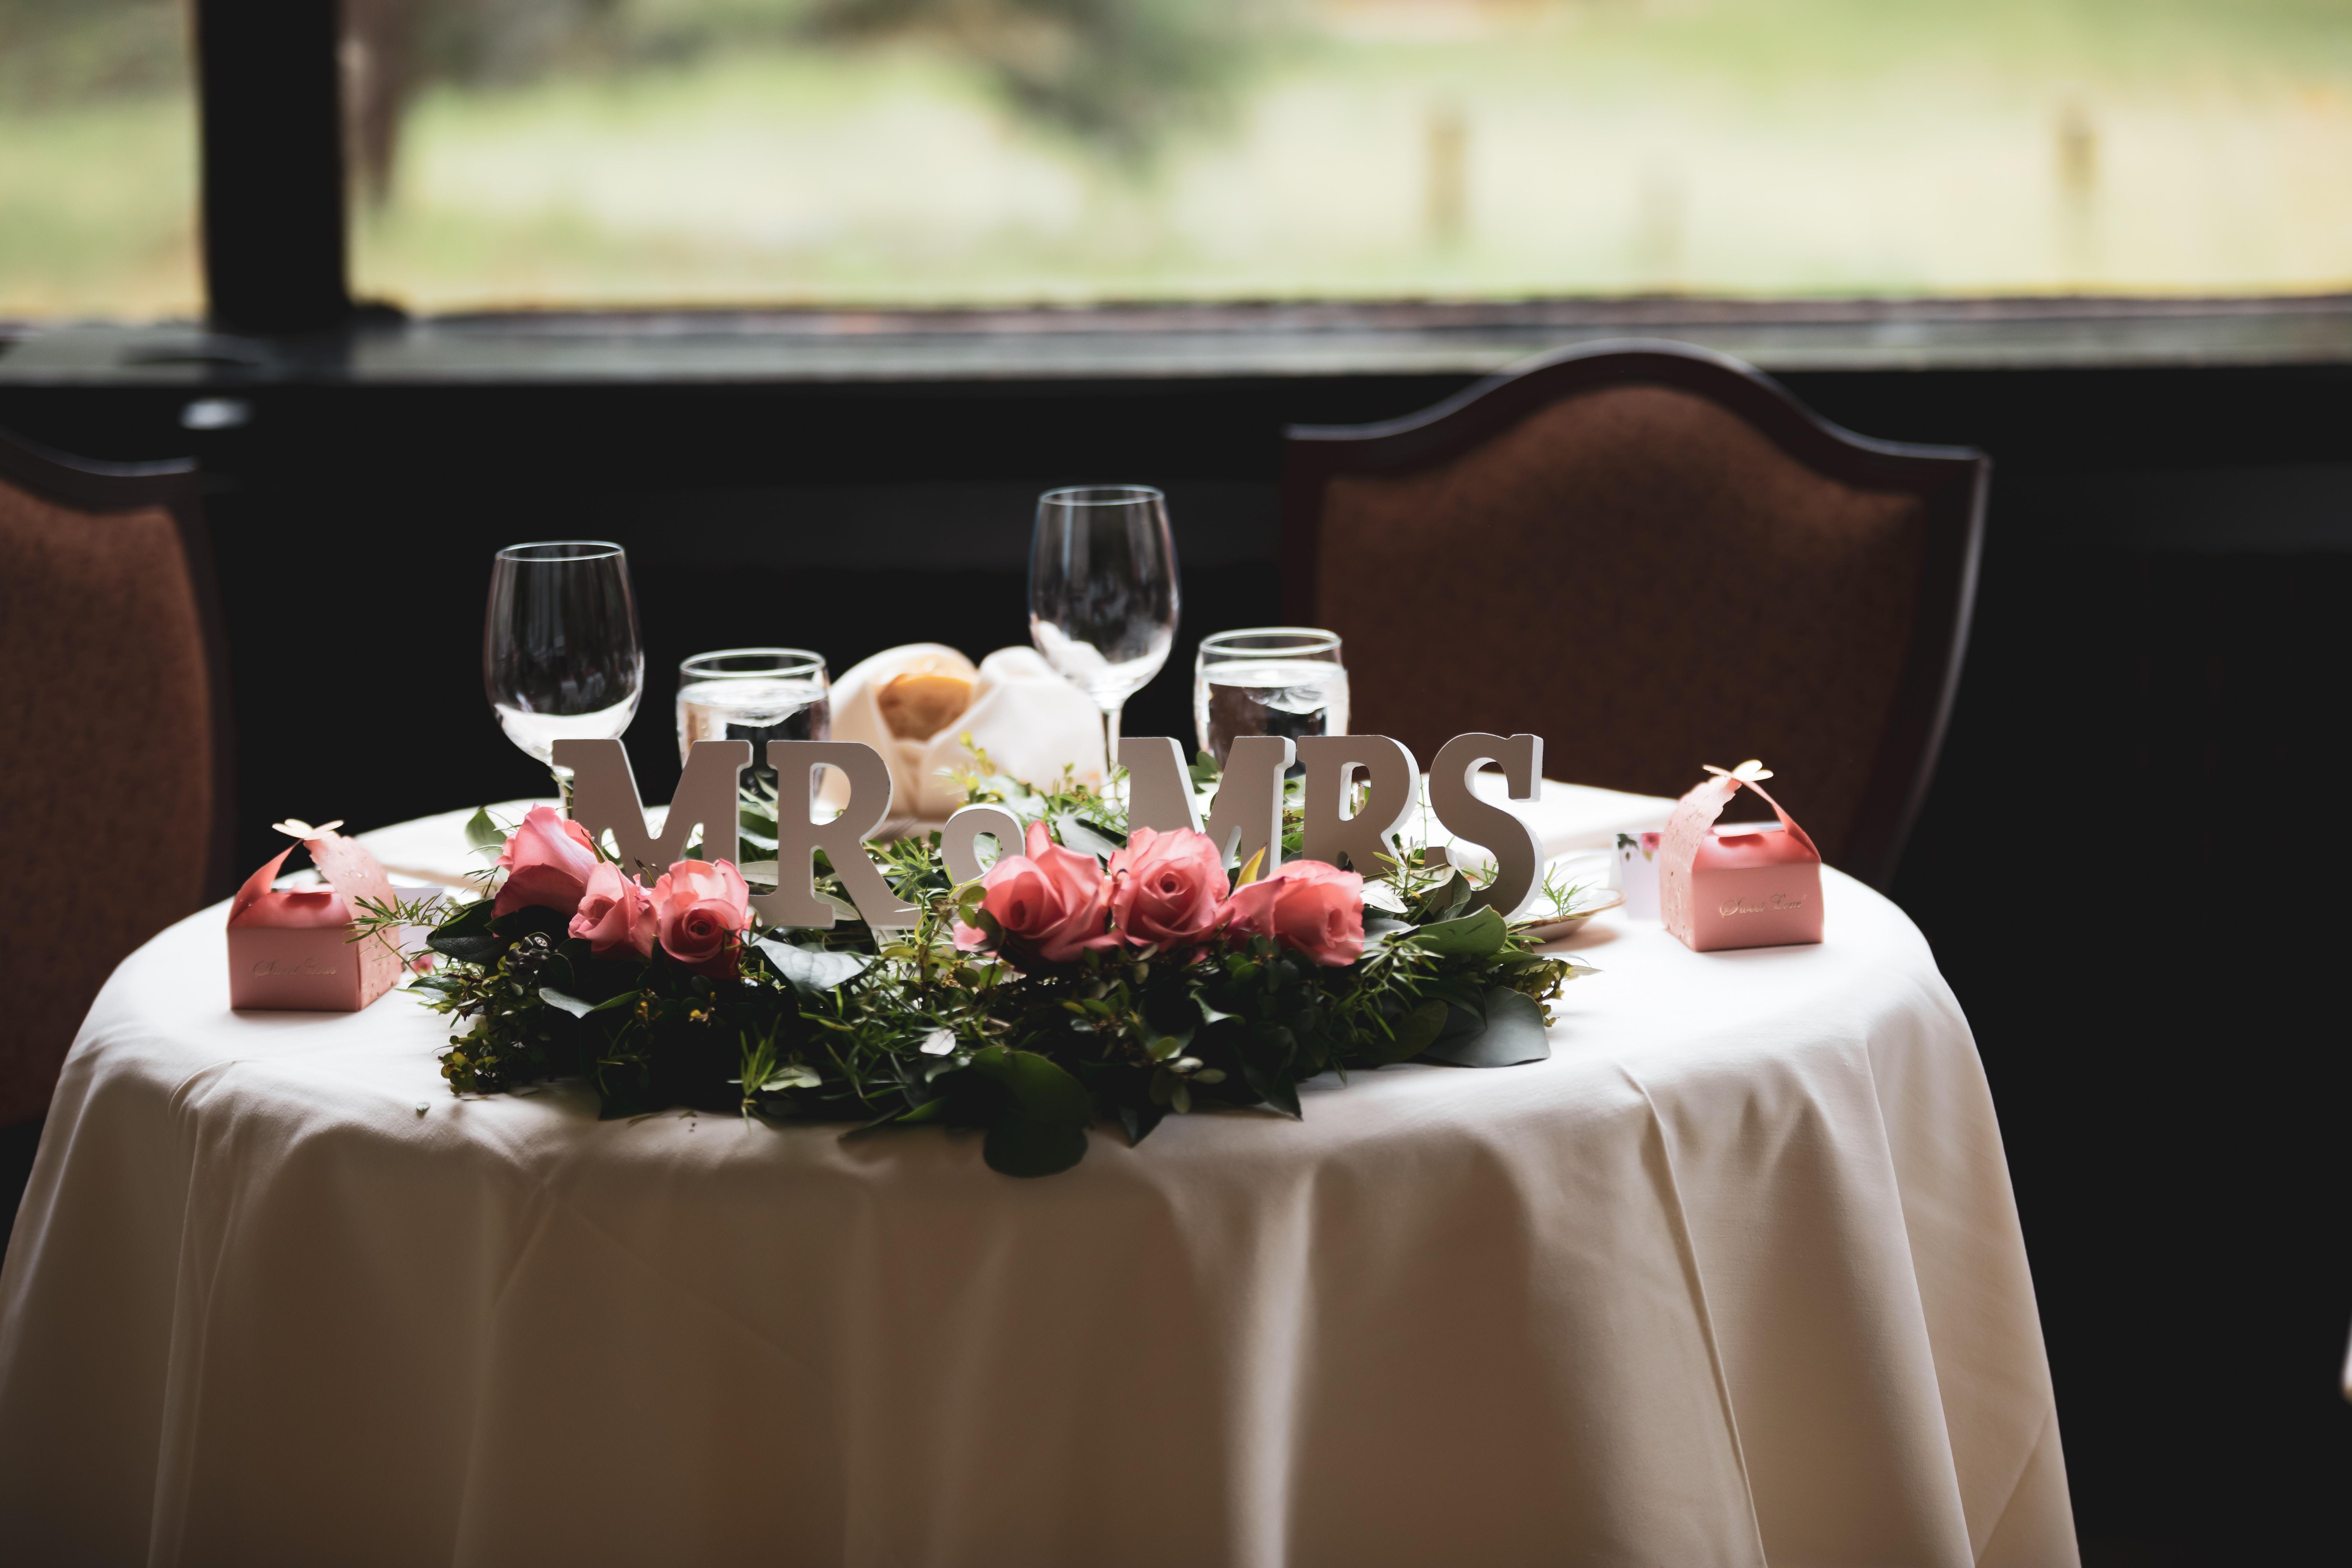 10 Essential Tips to Conquer Pre-Wedding Stress